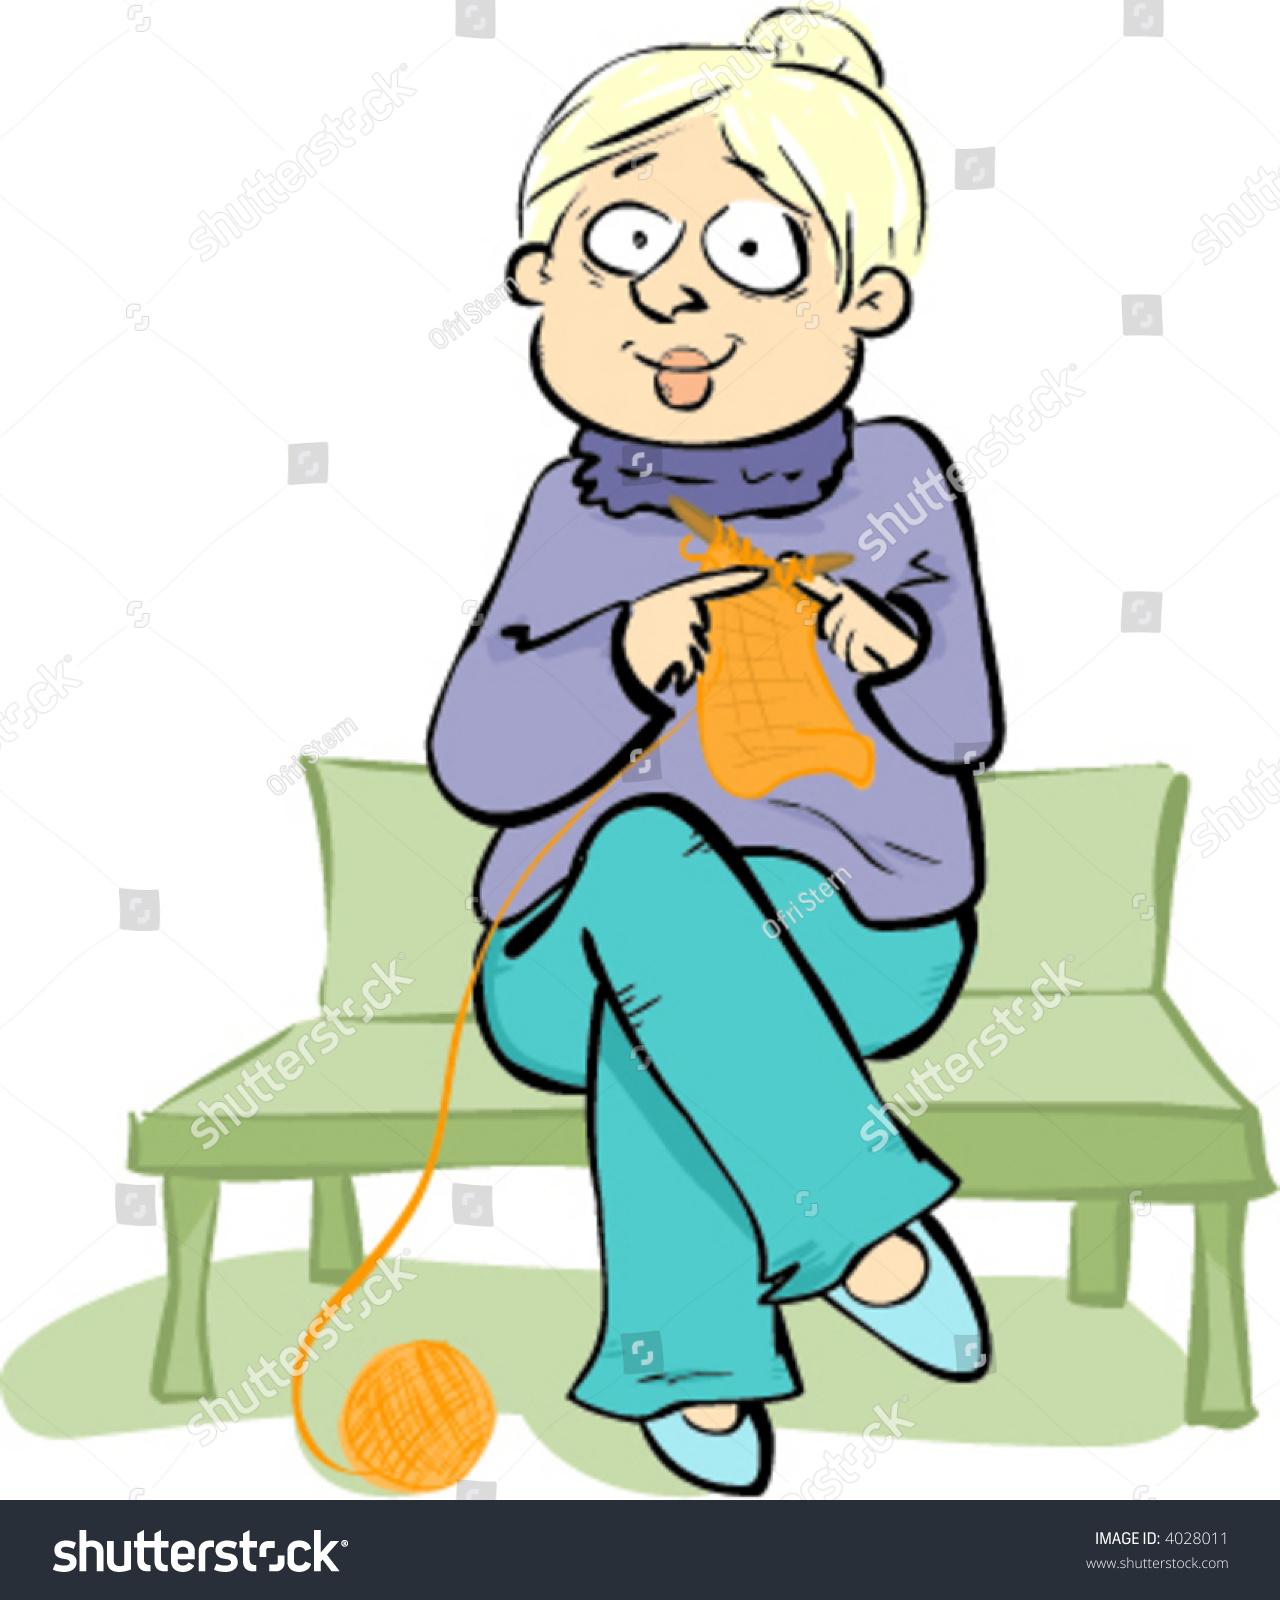 Grandma Knitting Cartoon : Grandma is knitting in the part stock vector illustration